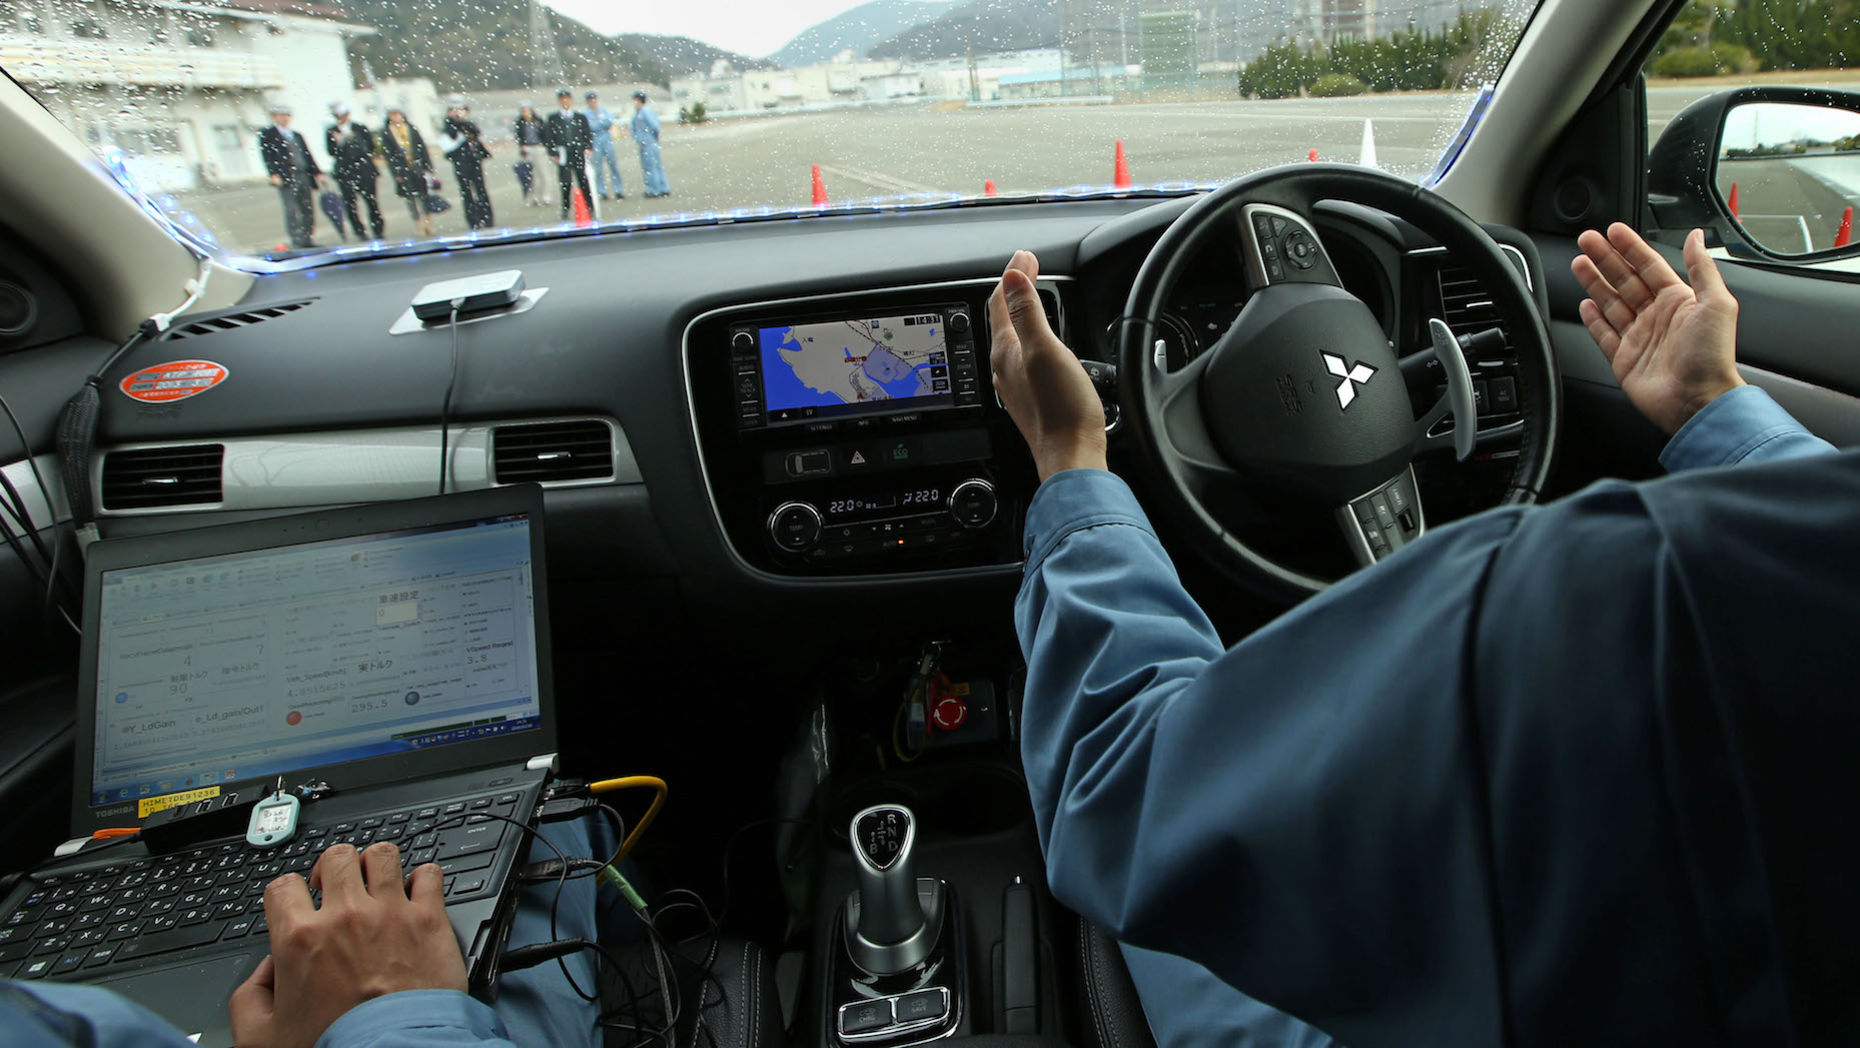 A self-driving Mitsubishi car. Photo by Bloomberg.